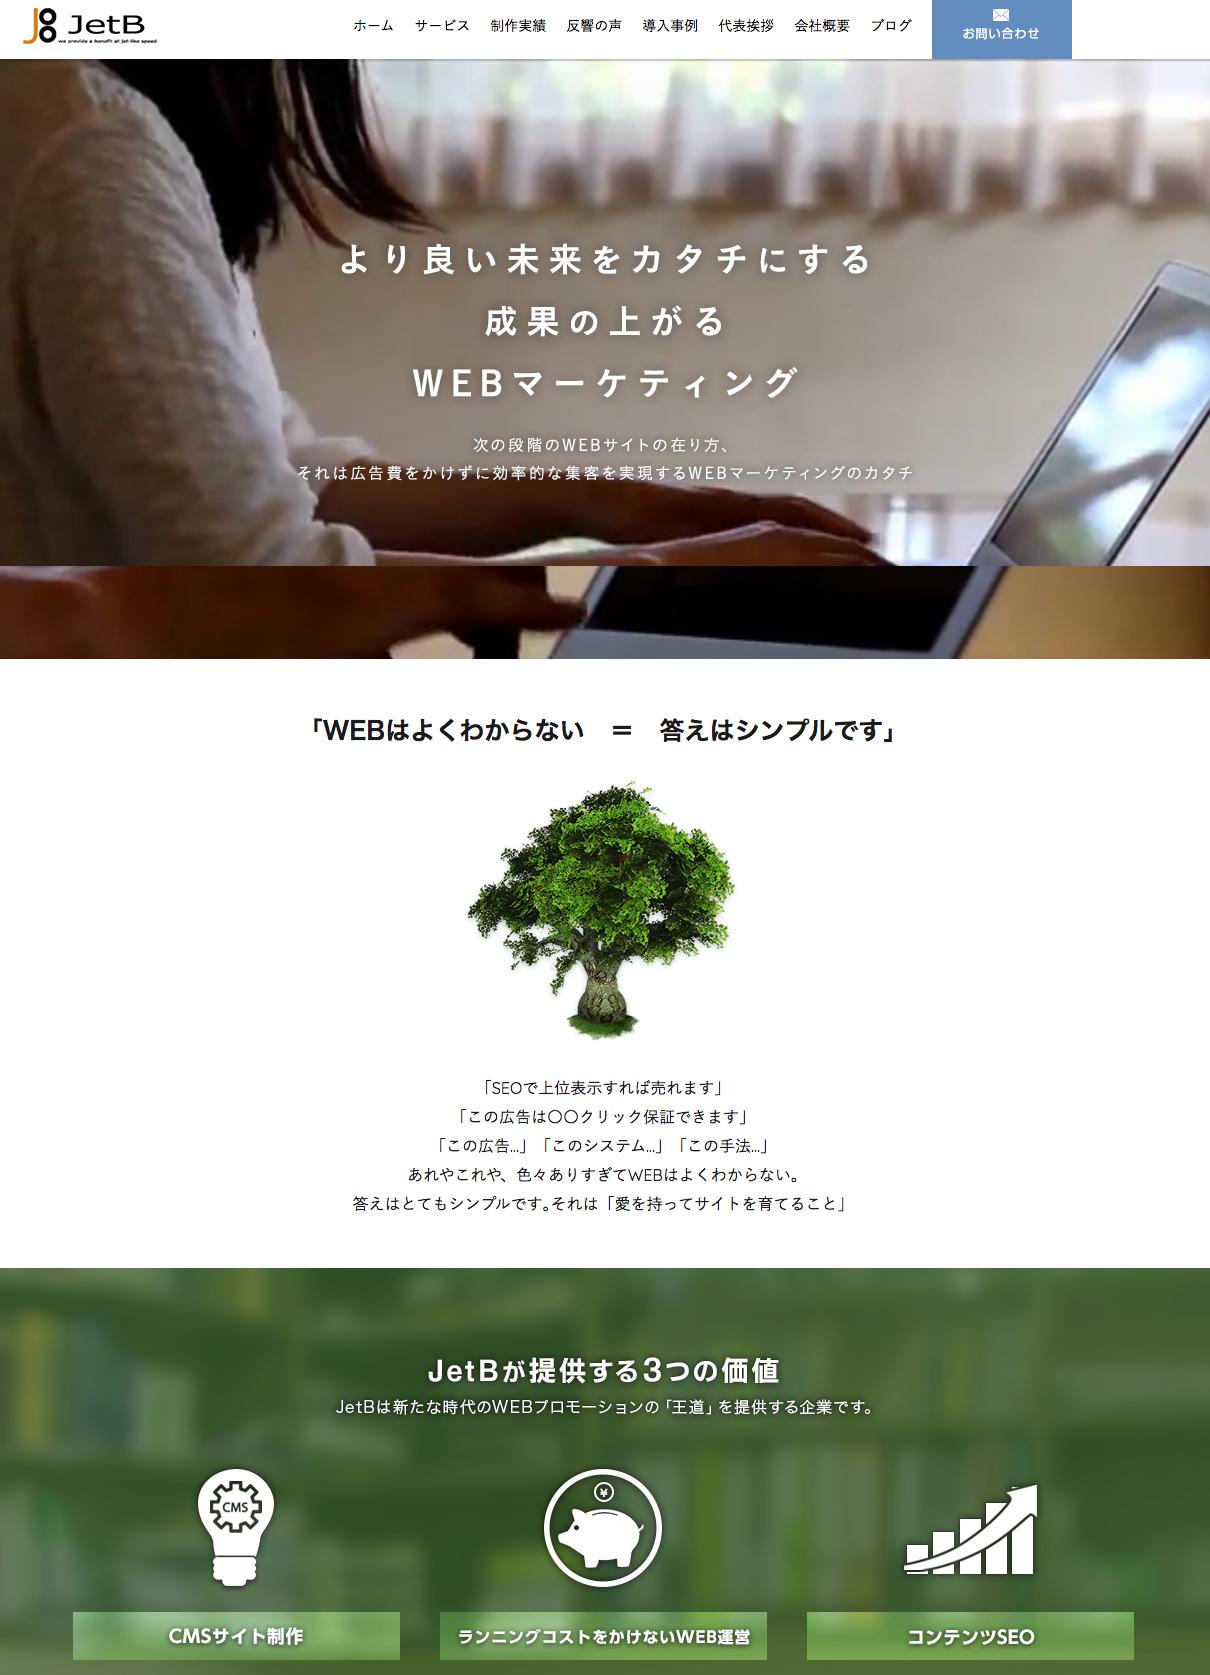 JetB株式会社